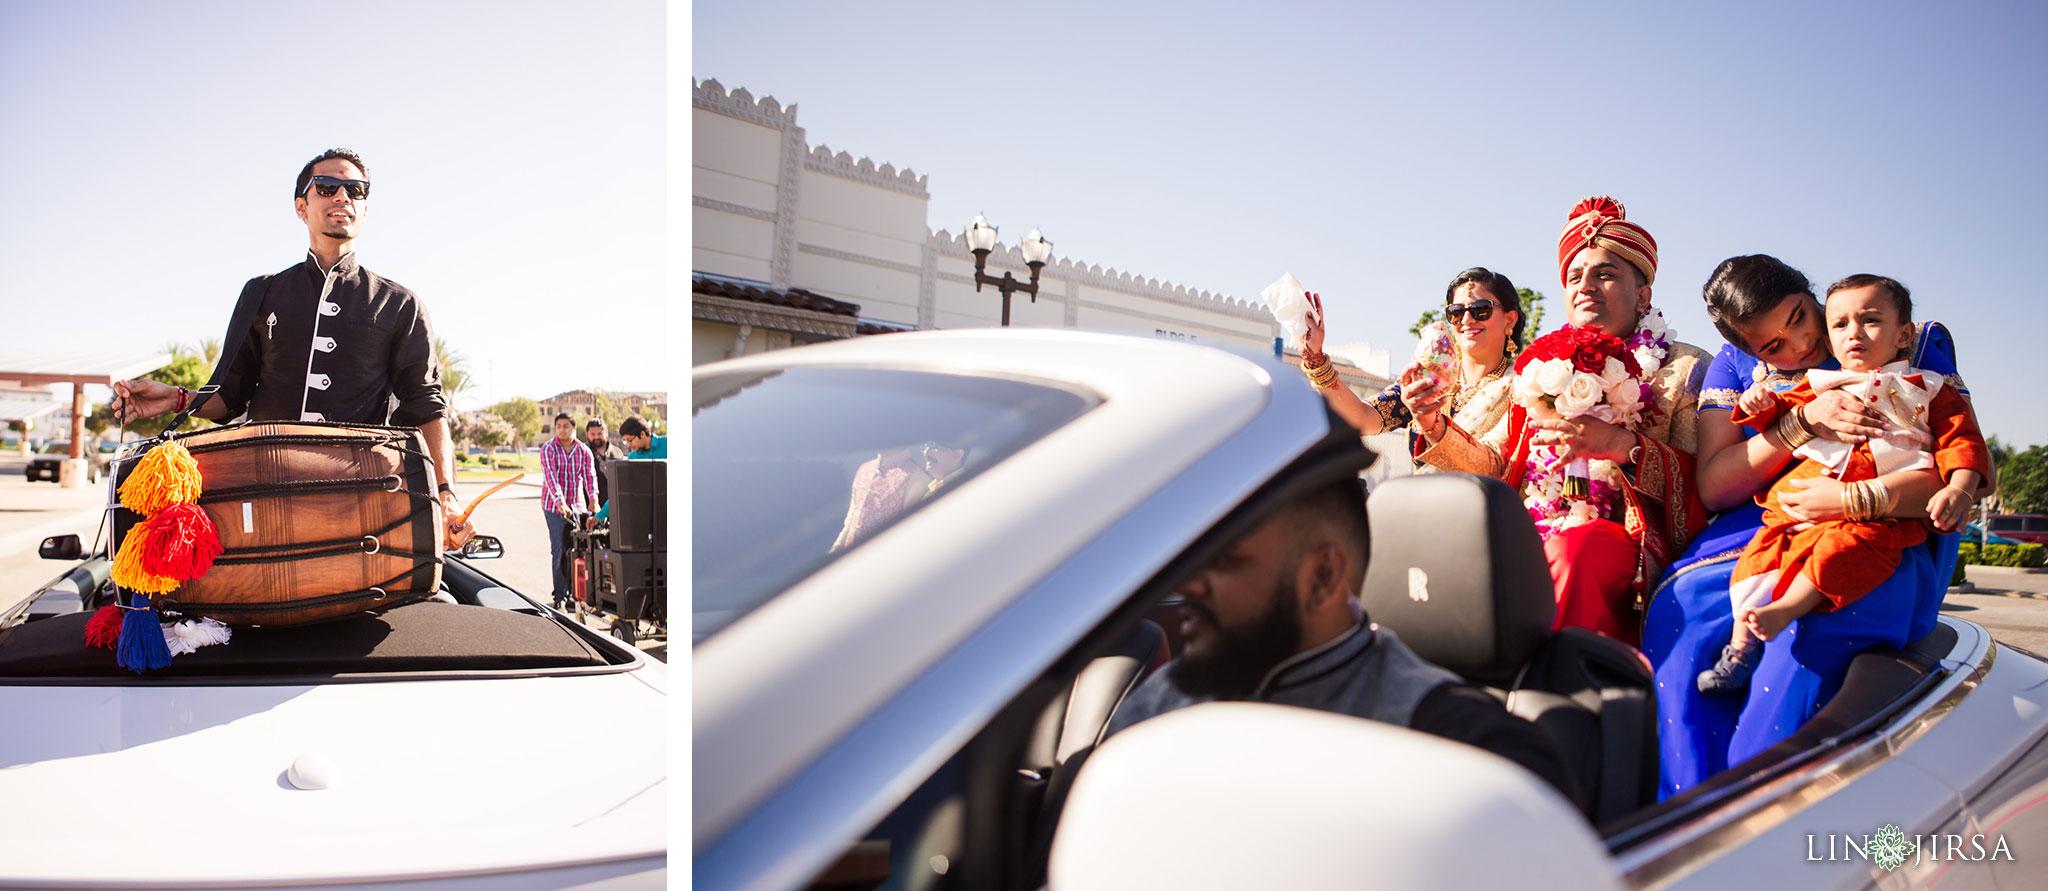 077 BAPS Swaminarayan Sanstha Chino Hills Indian Wedding Photography